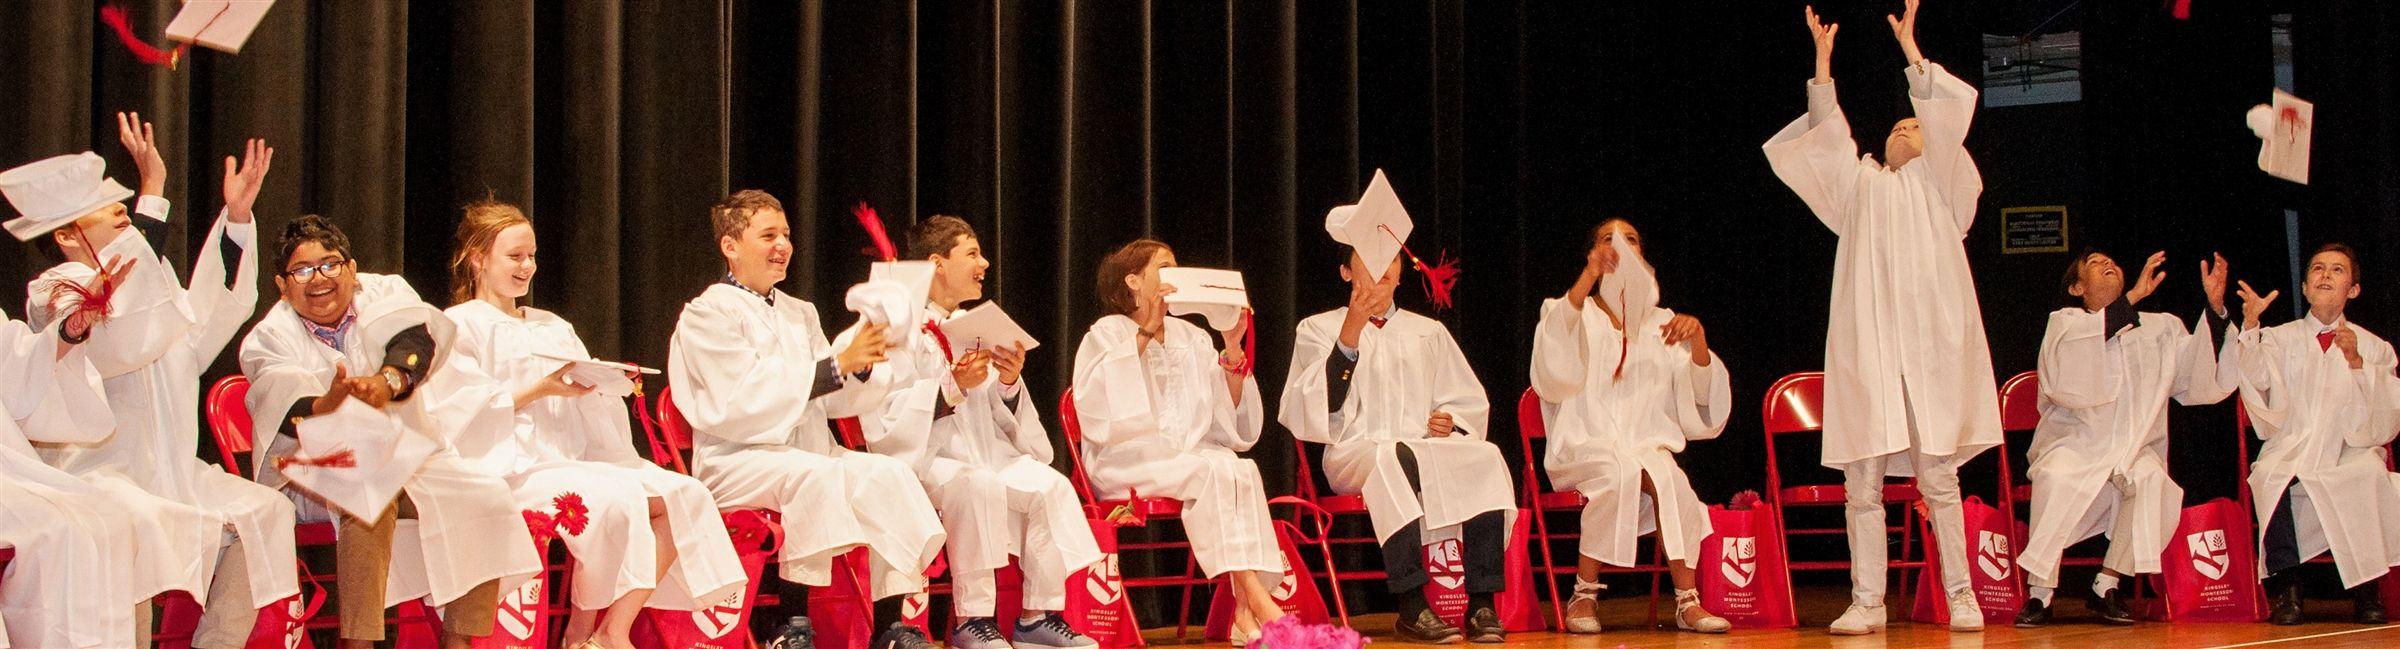 the kingsley graduate